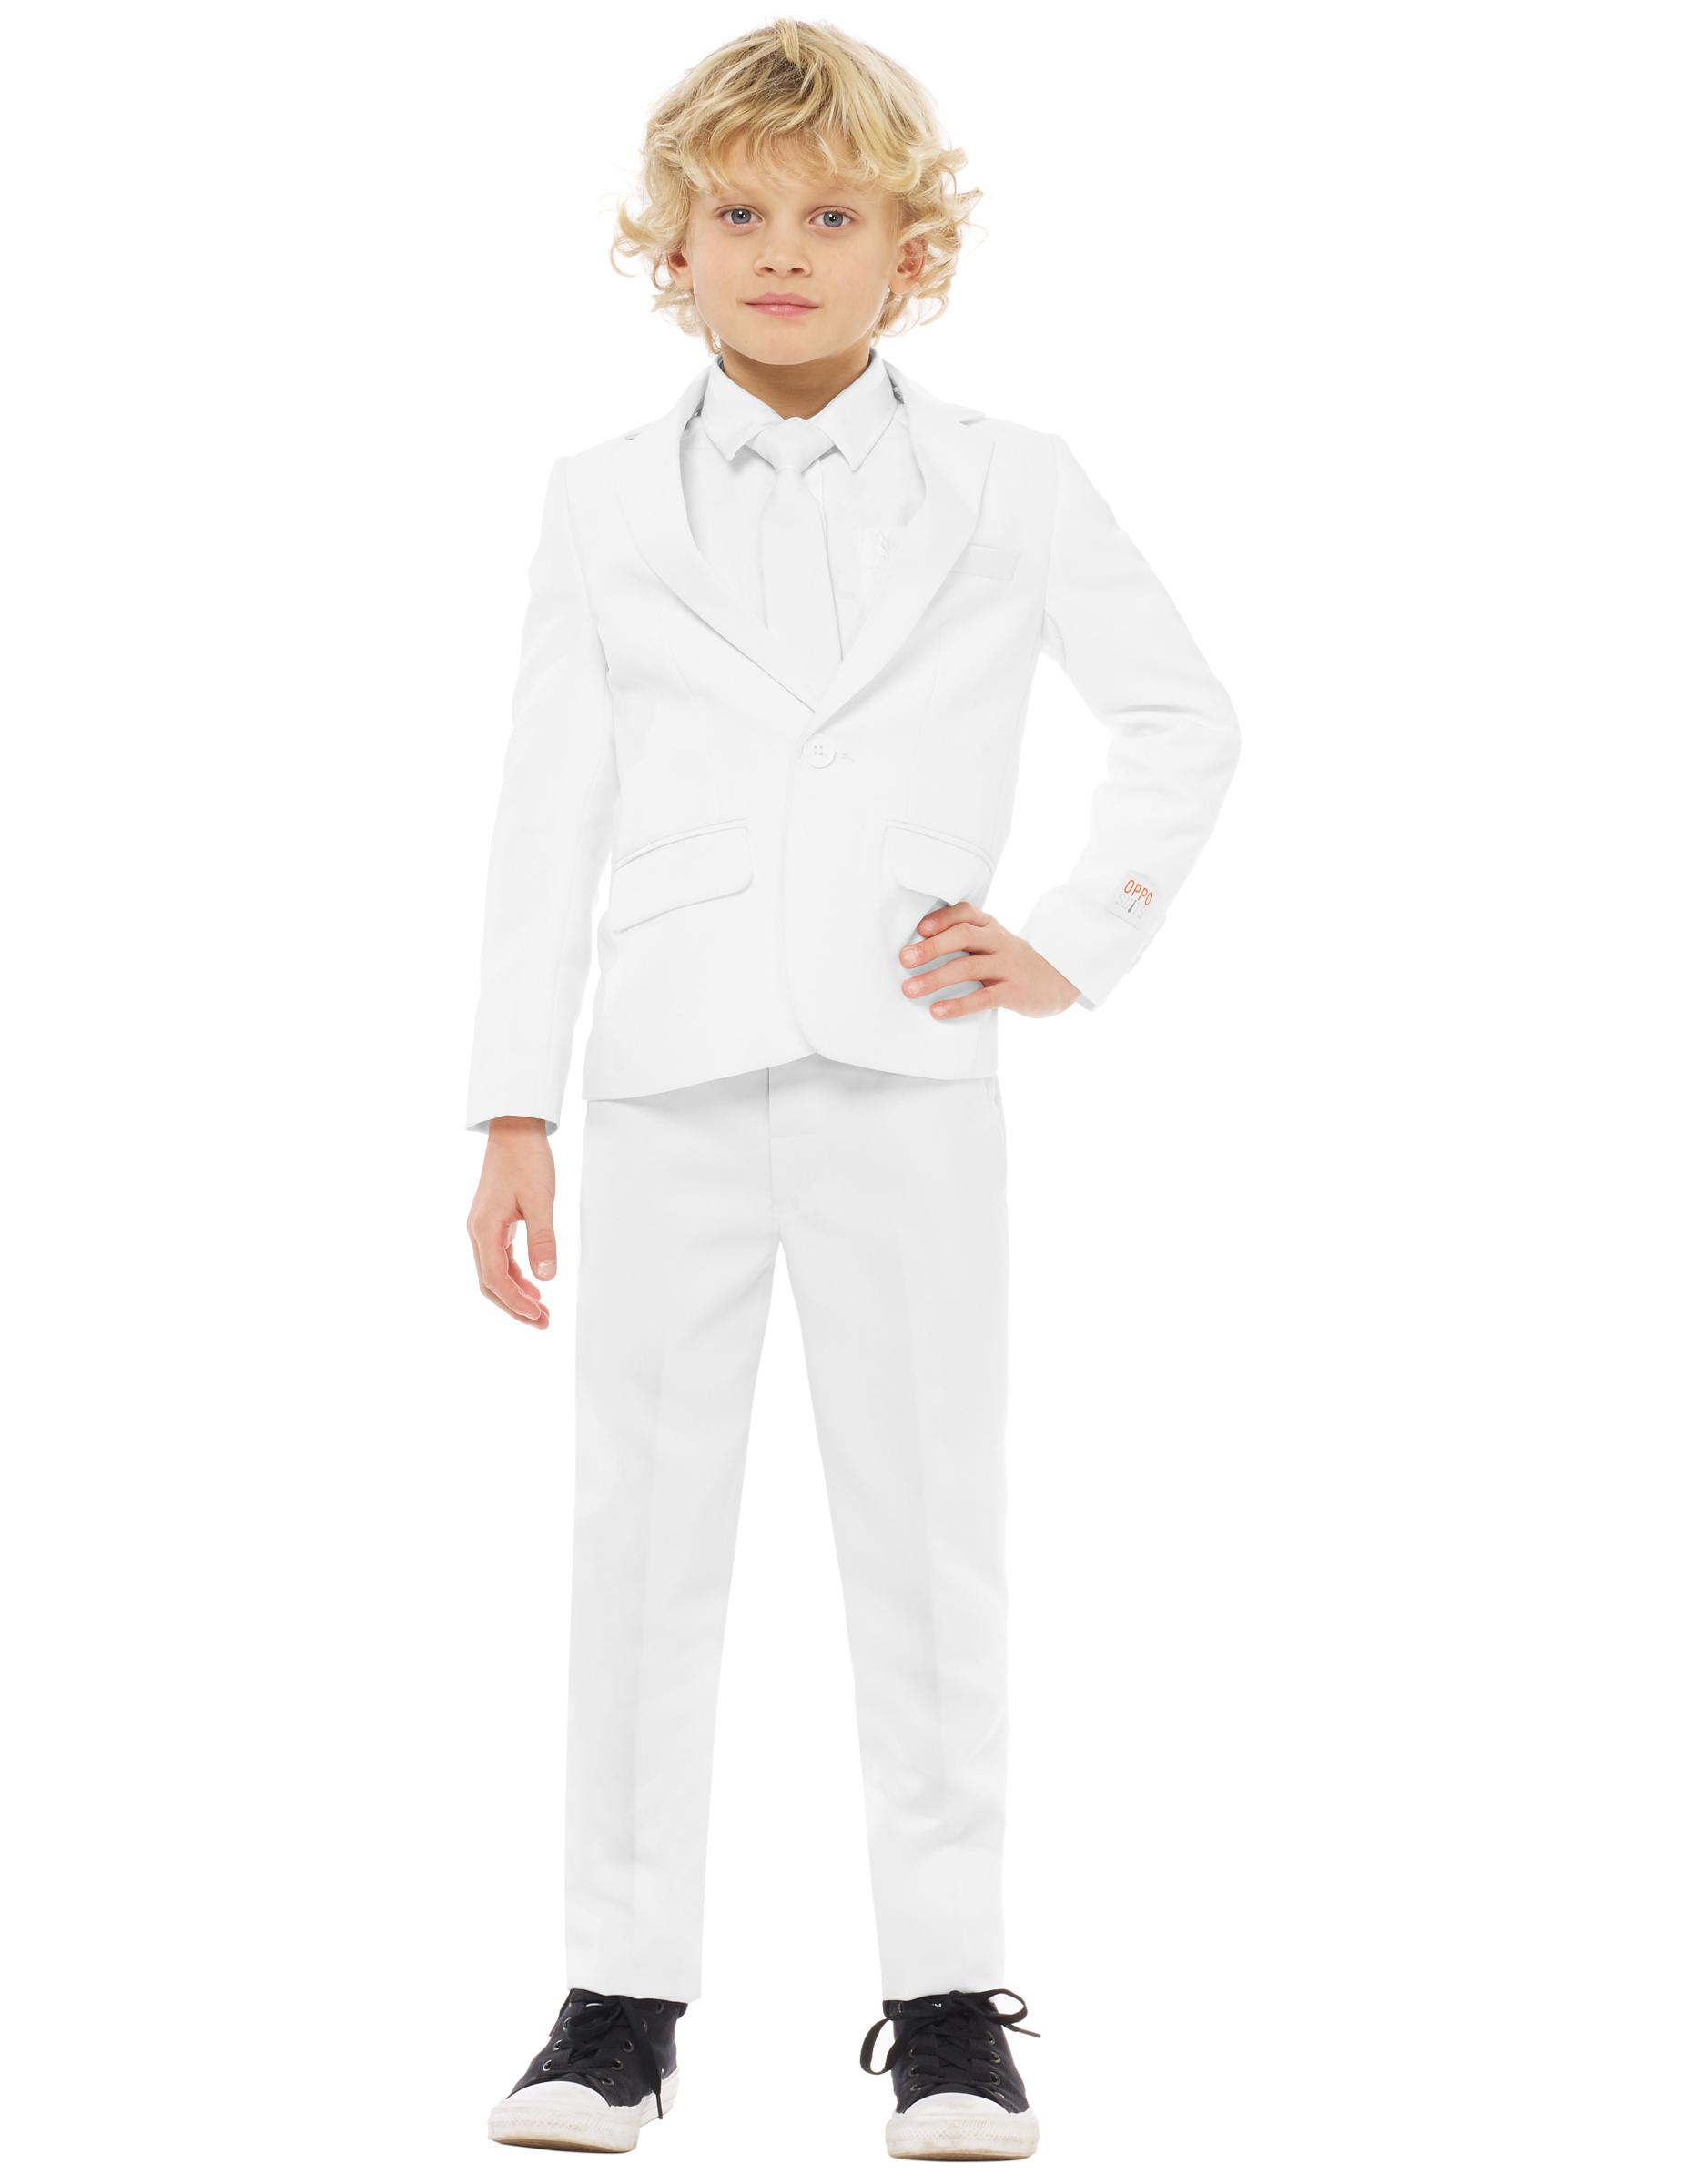 cba69b8c8 Traje Mr. Blanco niño Opposuits™  Disfraces niños